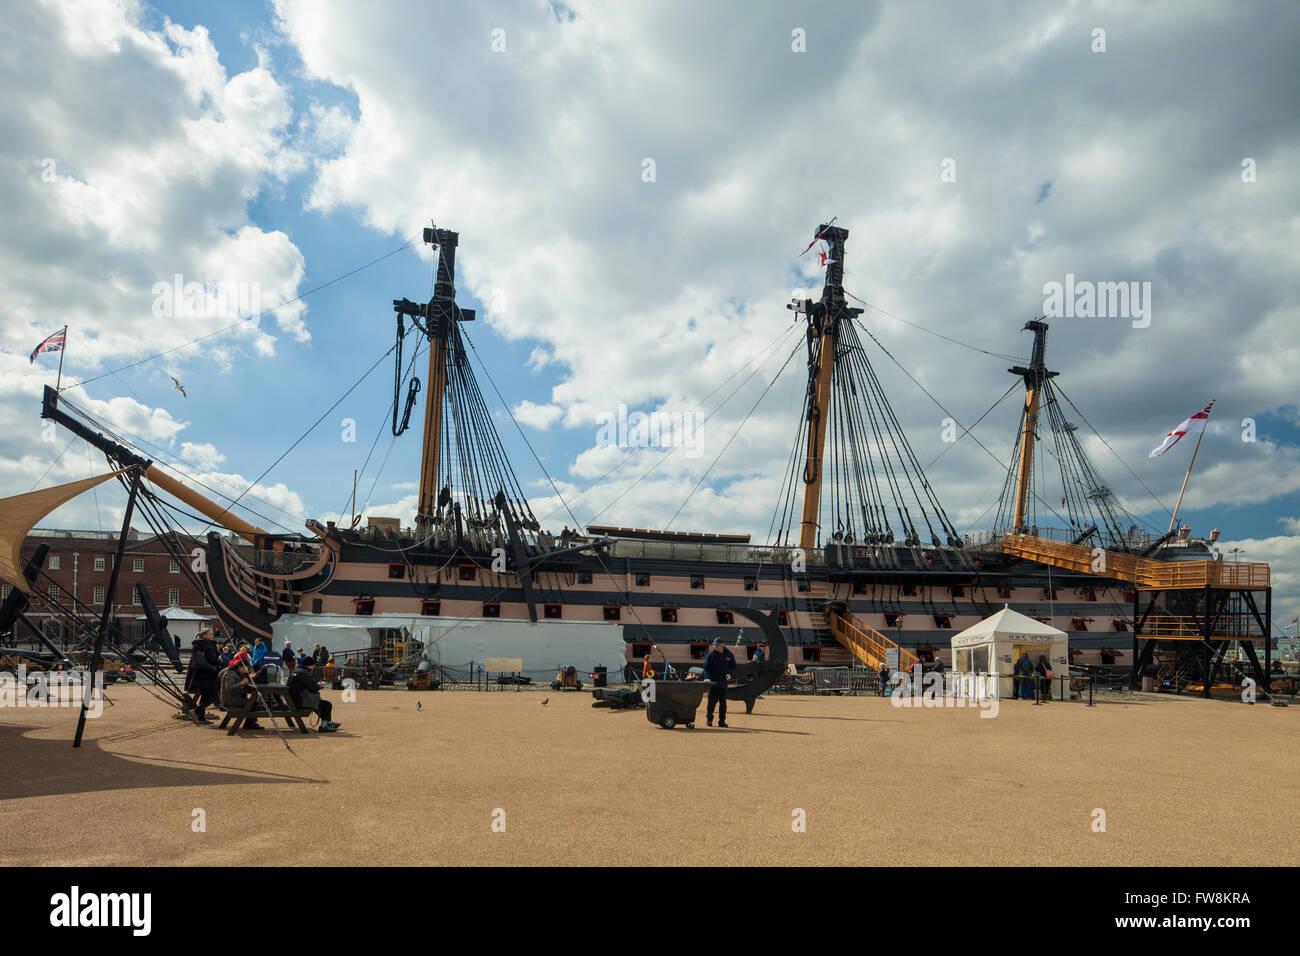 HMS Victory in Portsmouth Historic Dockyard, UK. Stock Photo